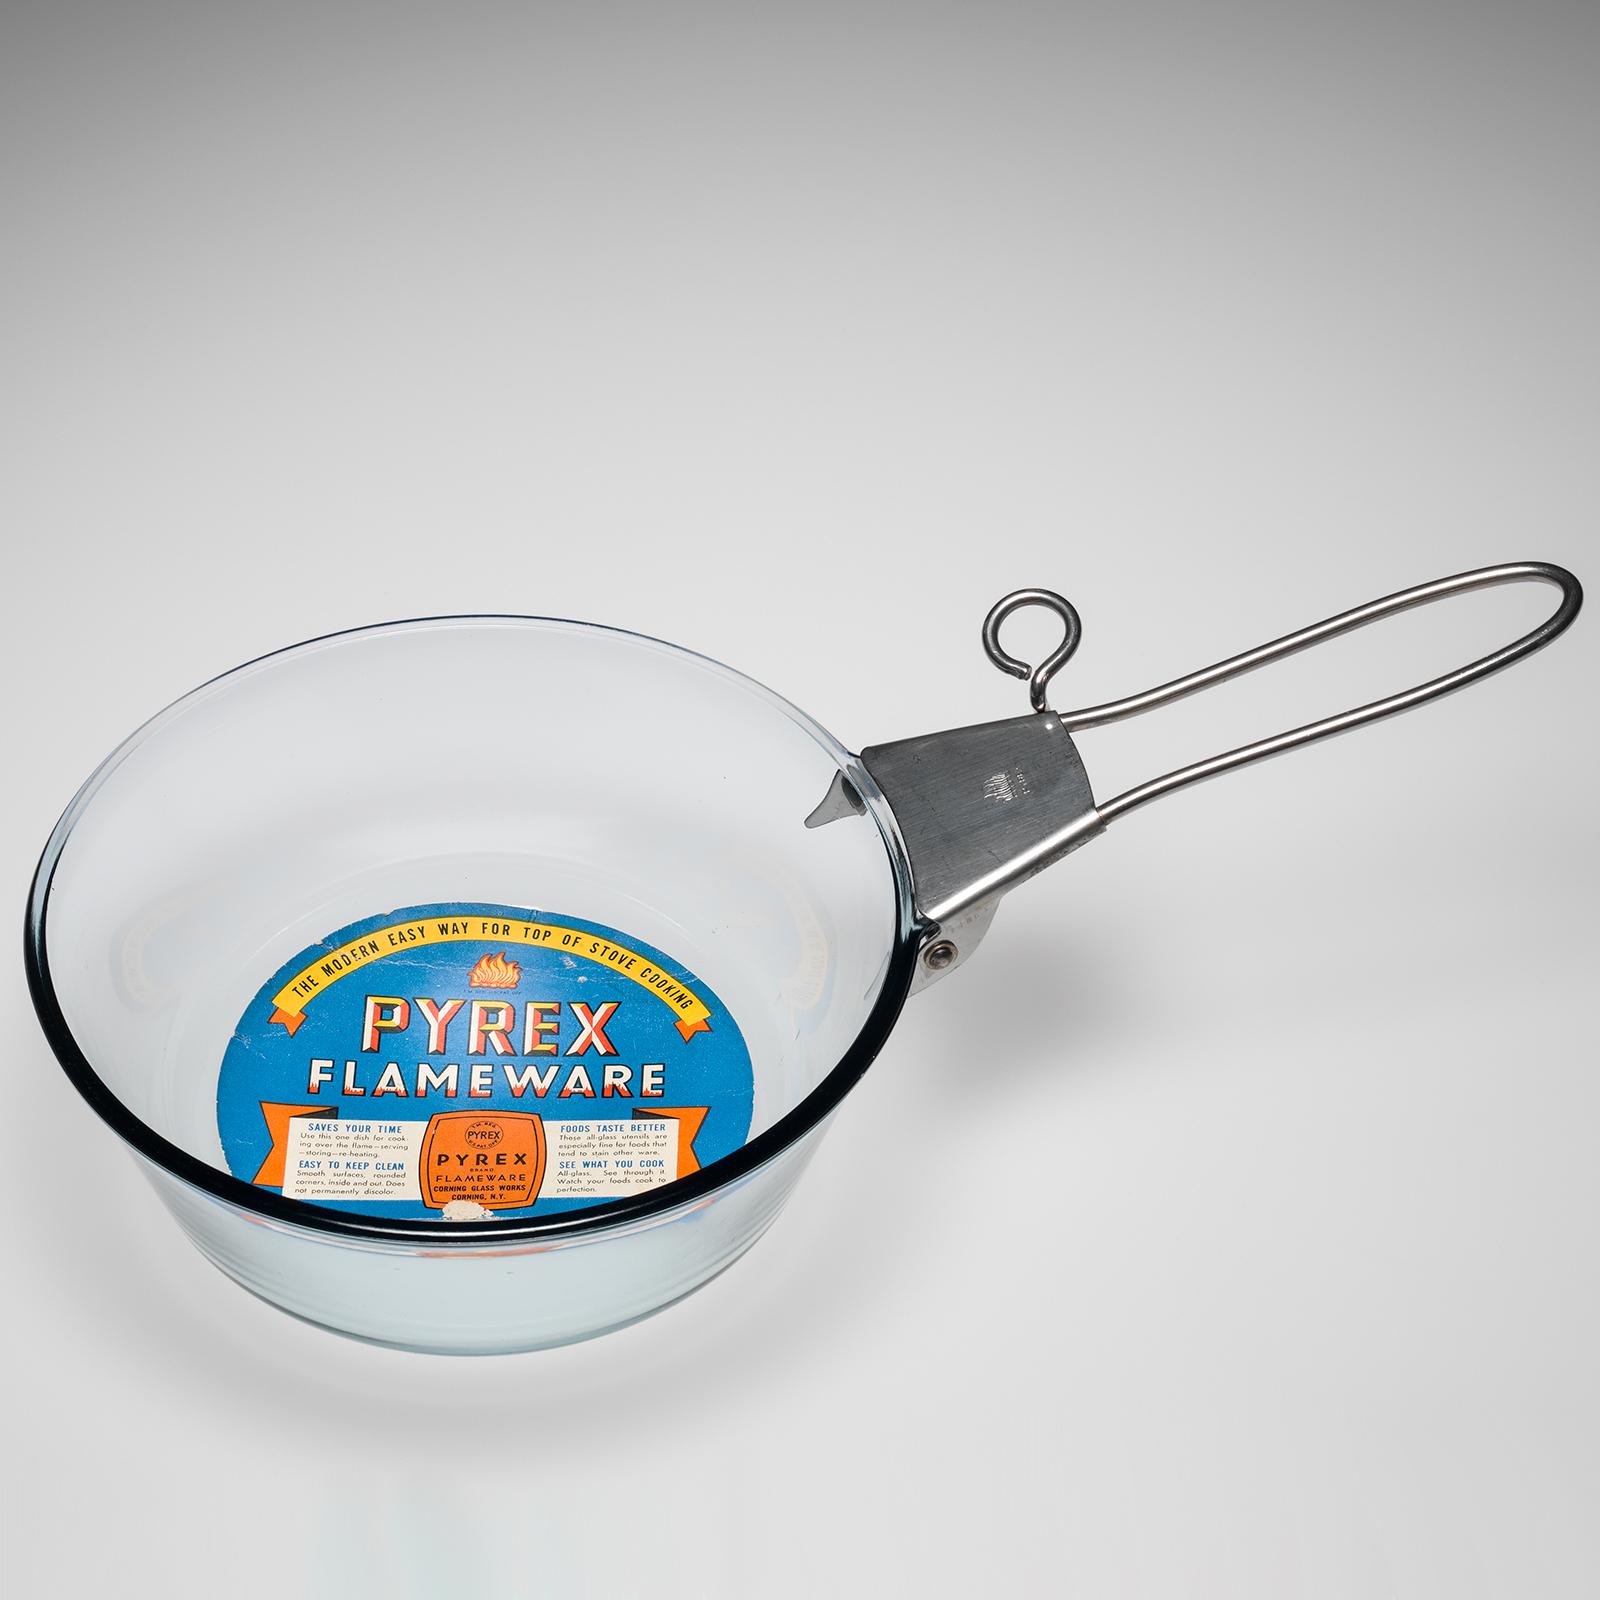 give time saving pyrex ware - HD1600×1600